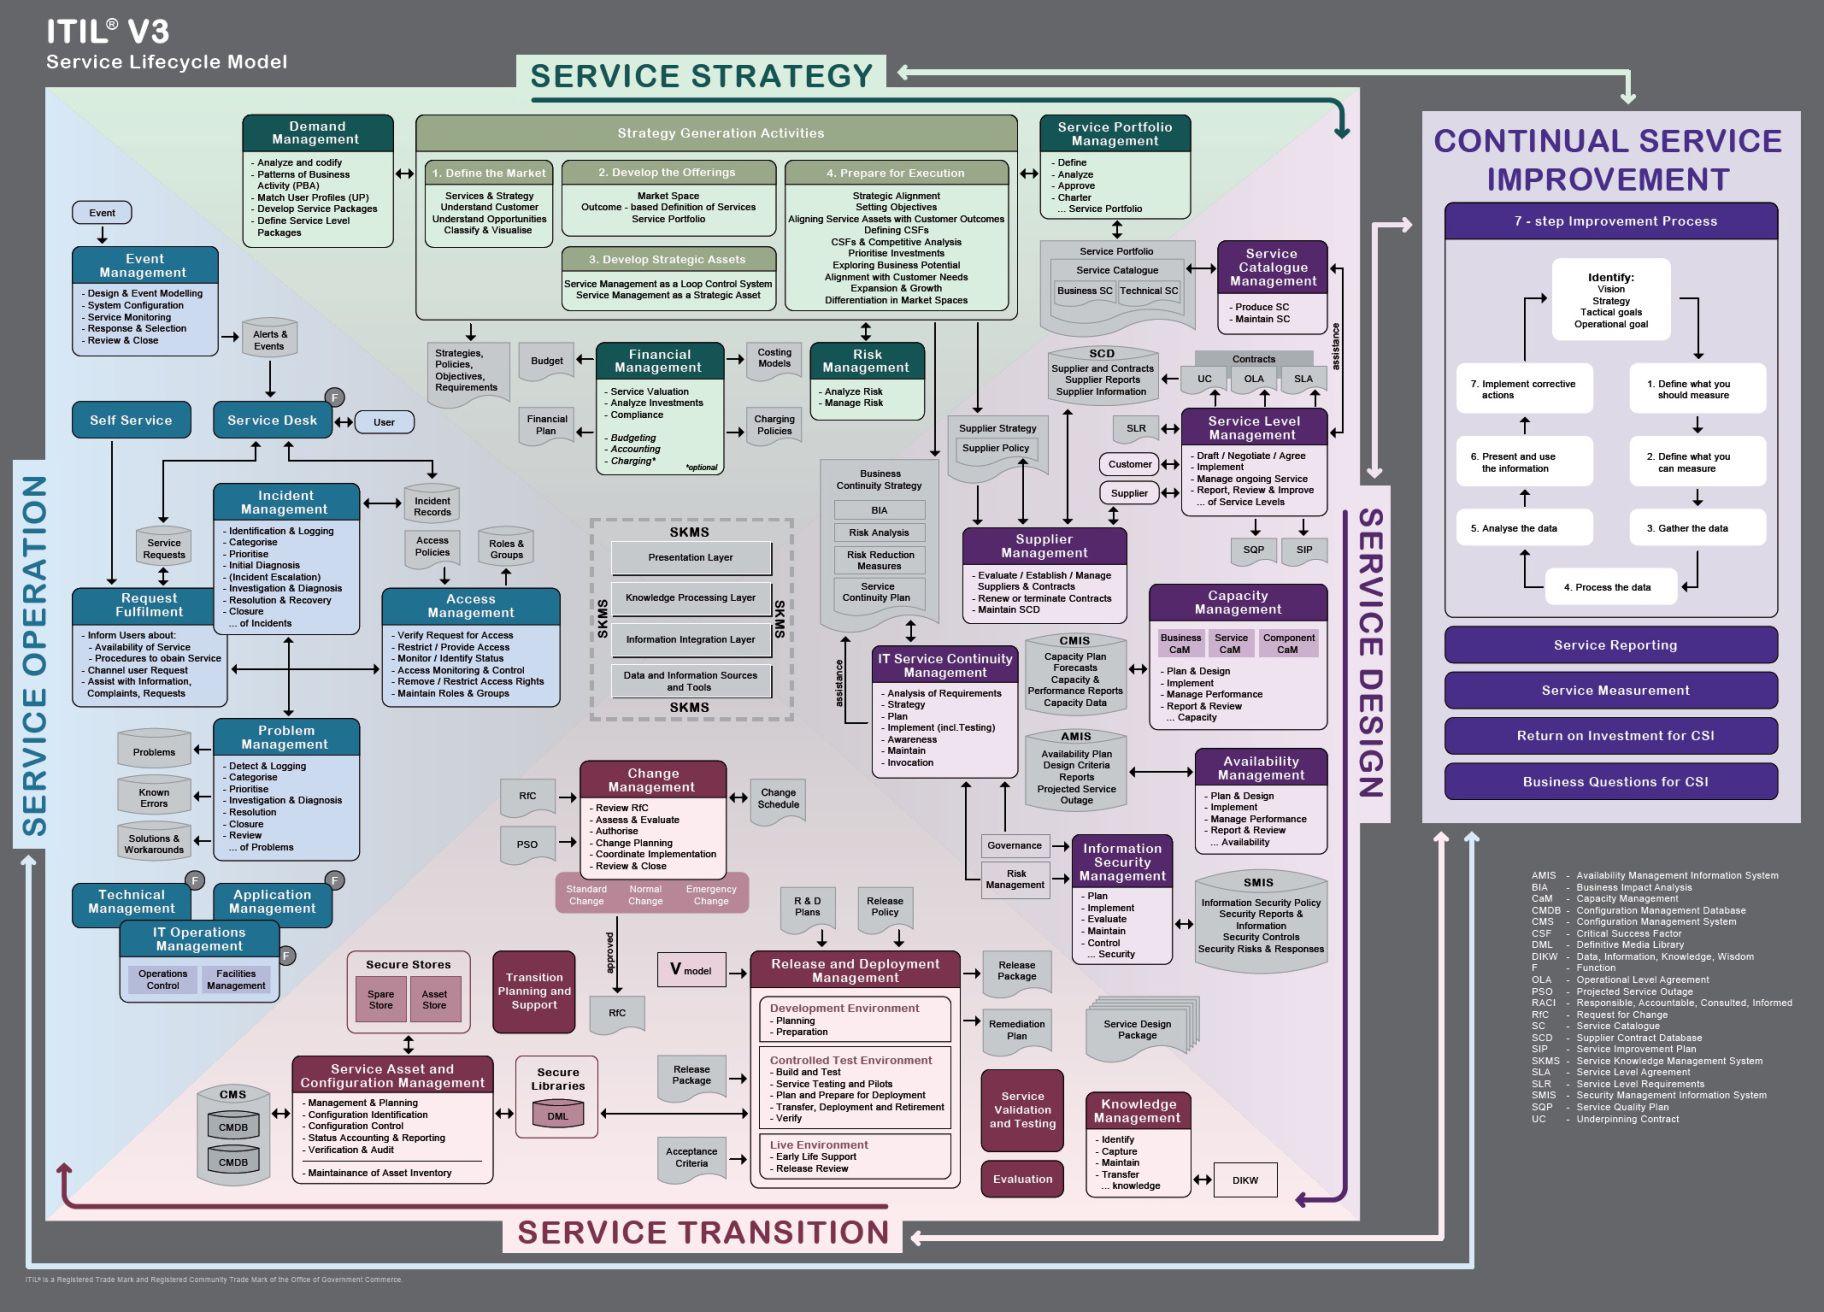 itil v3 templates - itil v3 service lifecycle model